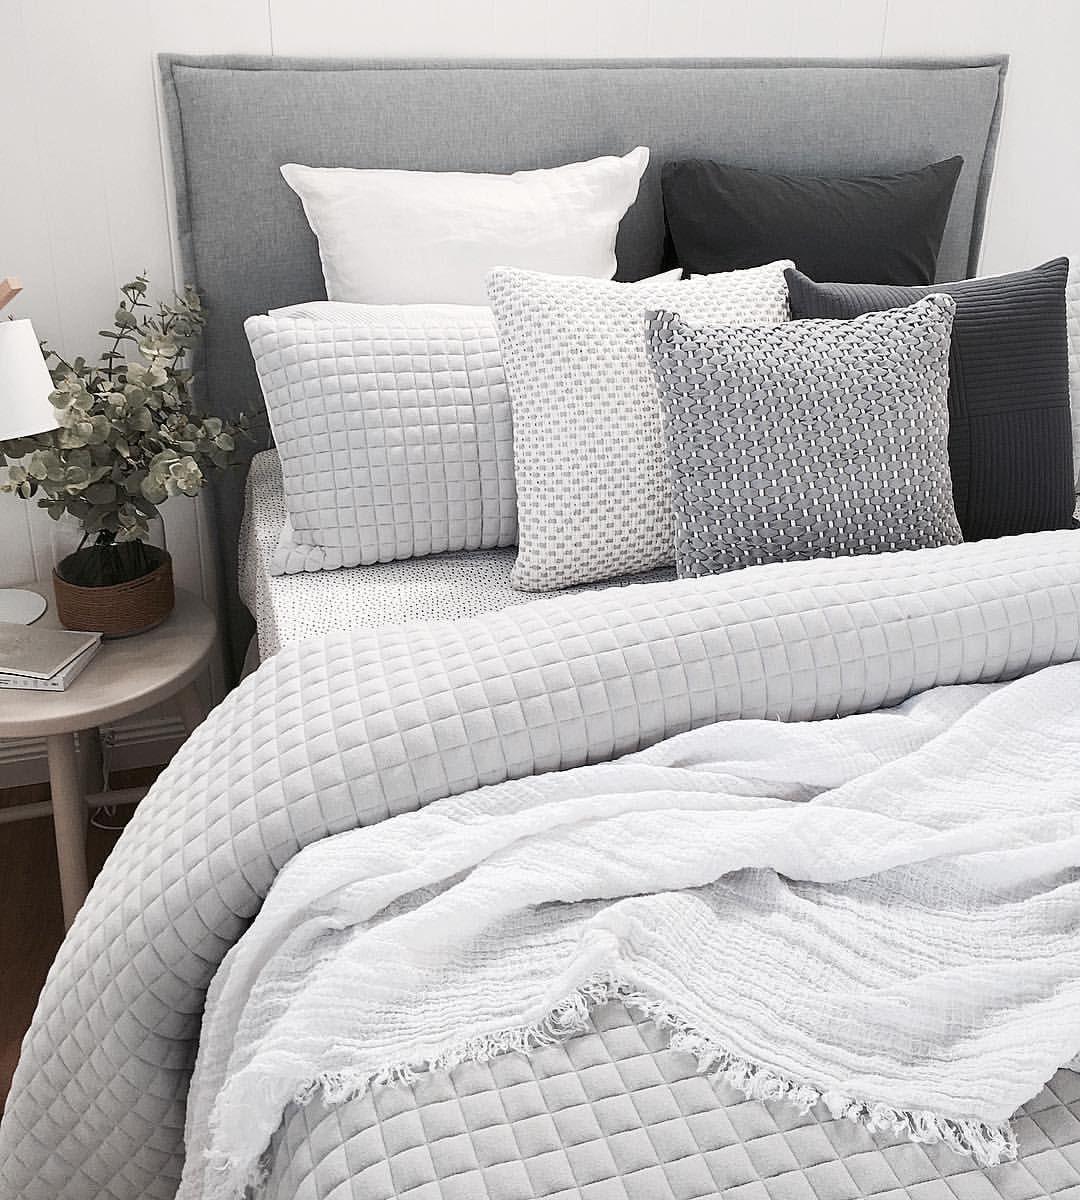 Master bedroom color schemes  bedroom color scheme for guy  girl  simple blackeywhite  My